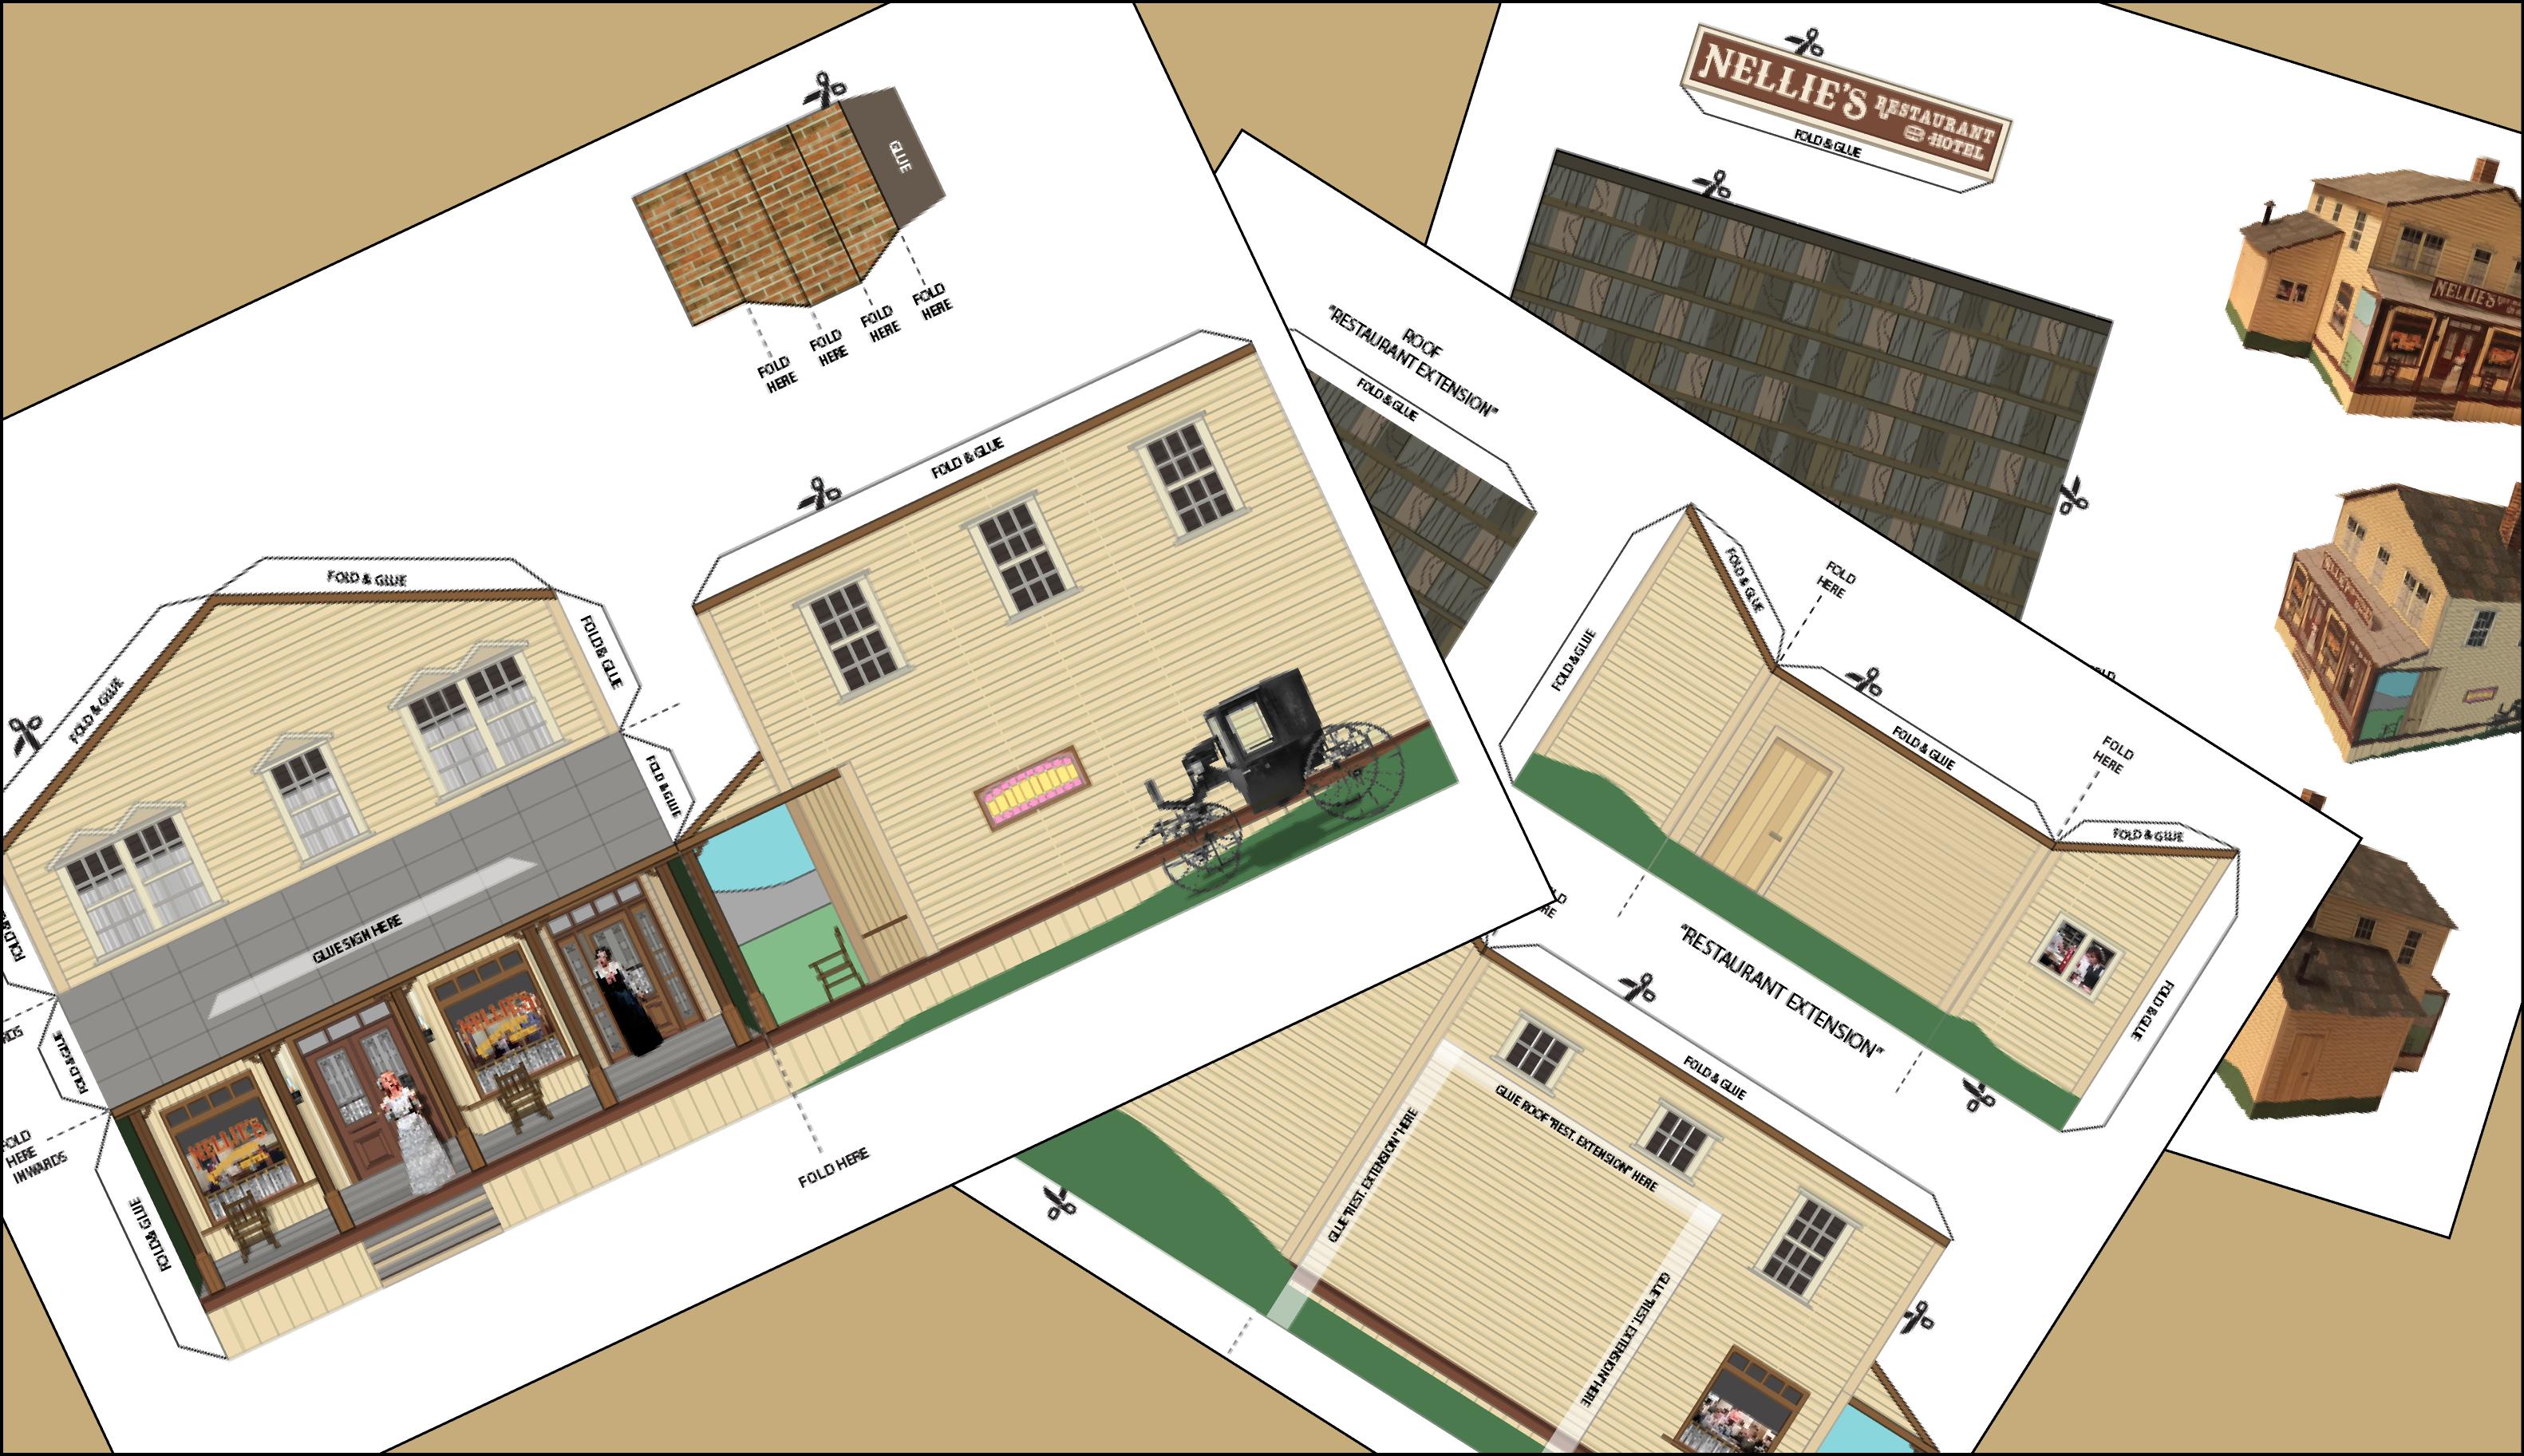 Pin On Little House On The Prairie Printables Diy